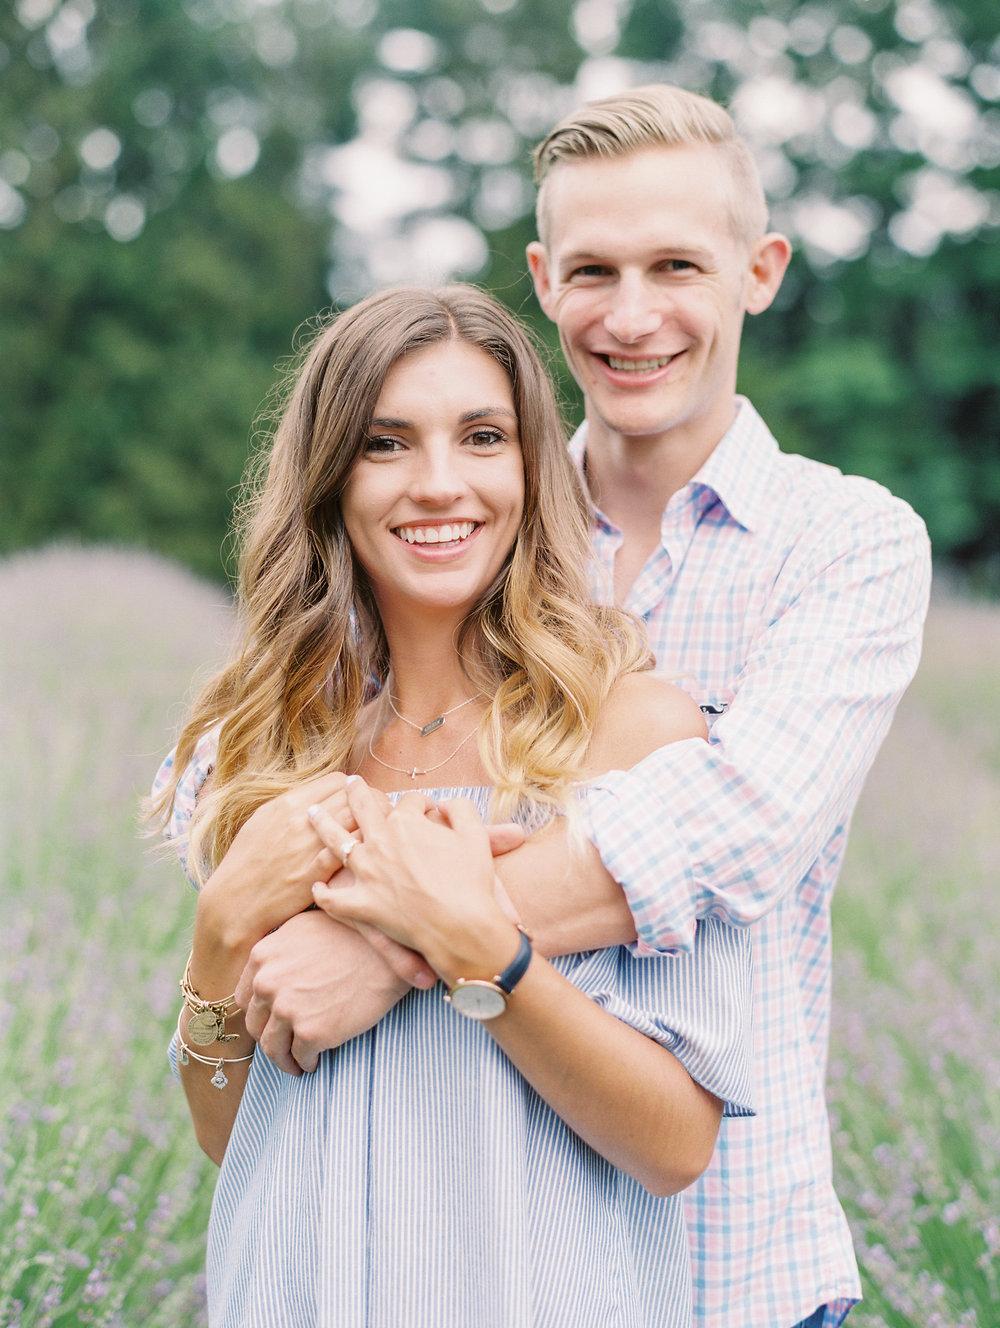 Kerri+Austin+Lavender+Field+Engagement-44.jpg